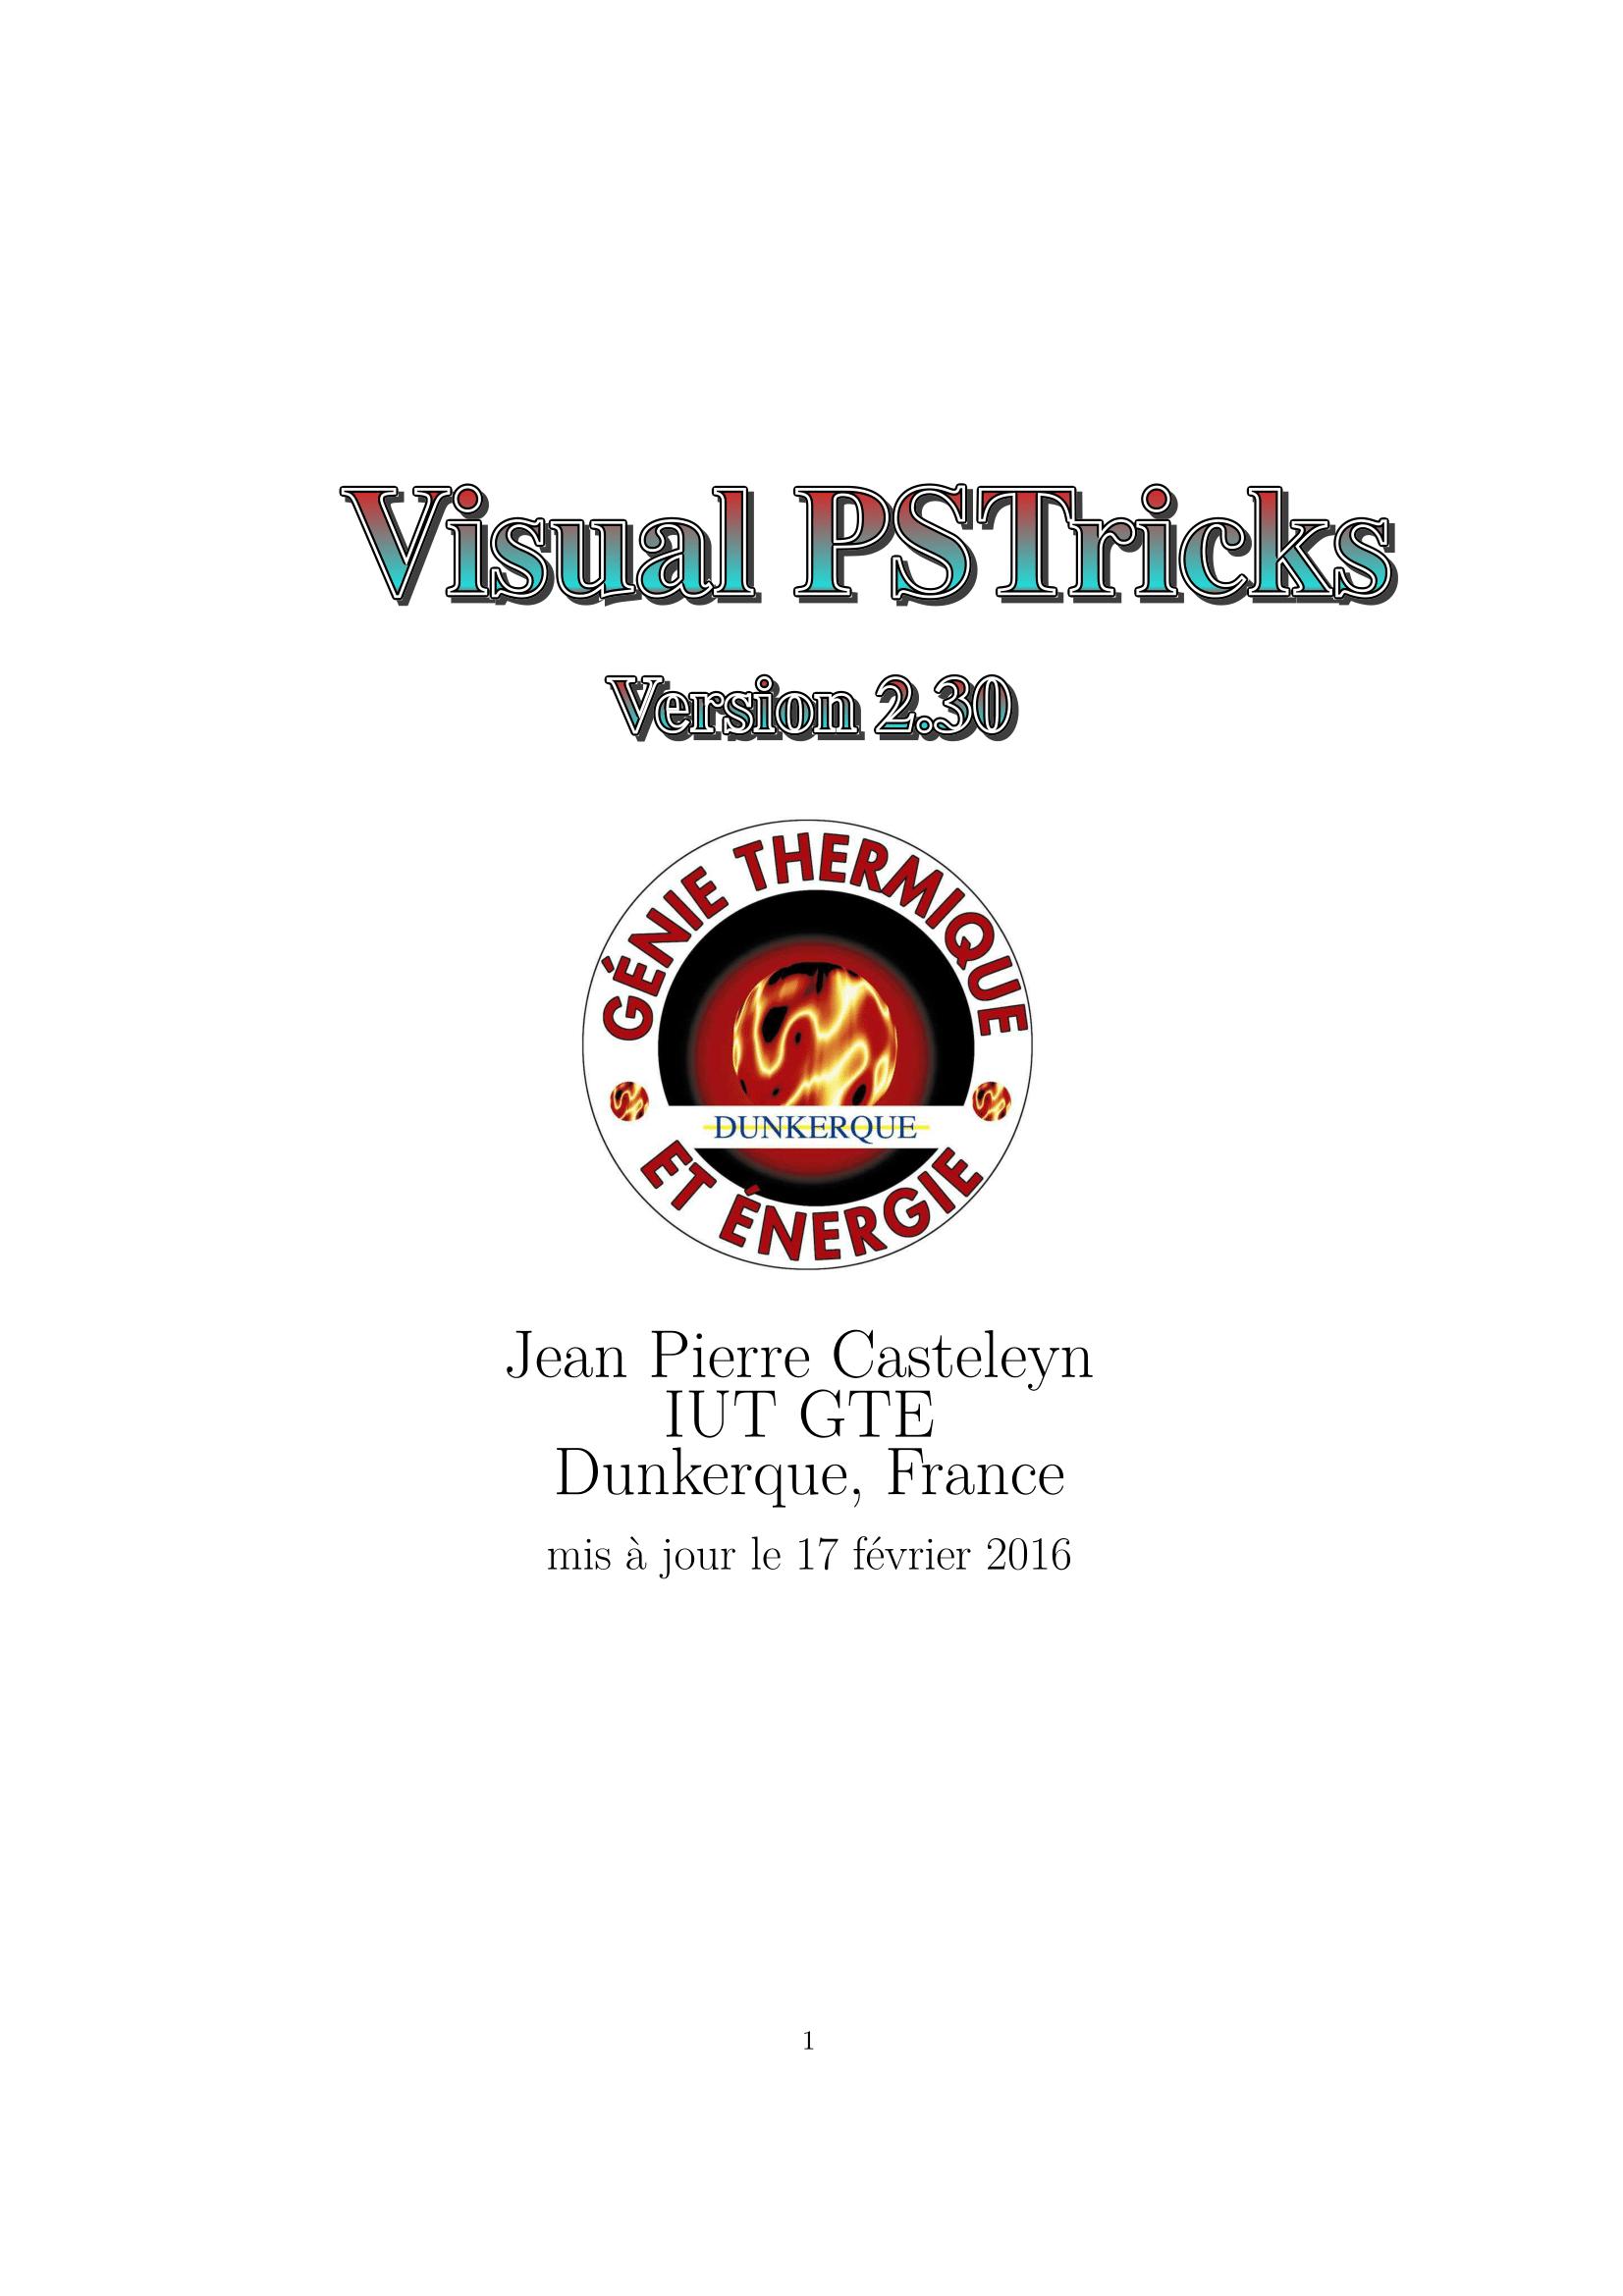 VisualPSTricks-01